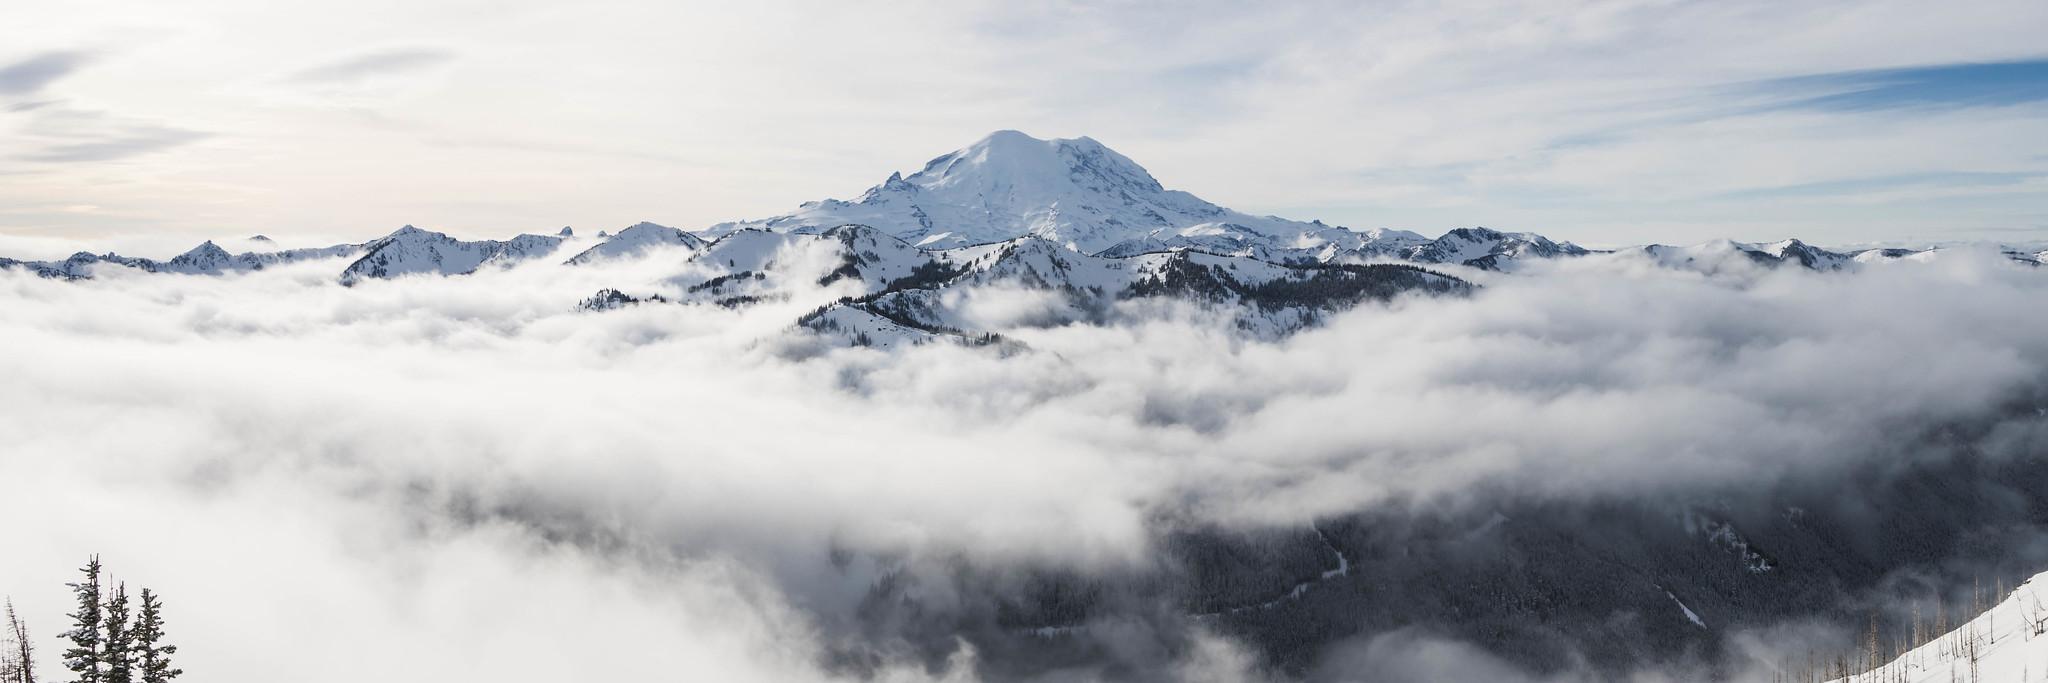 Mount Rainier panoramic view